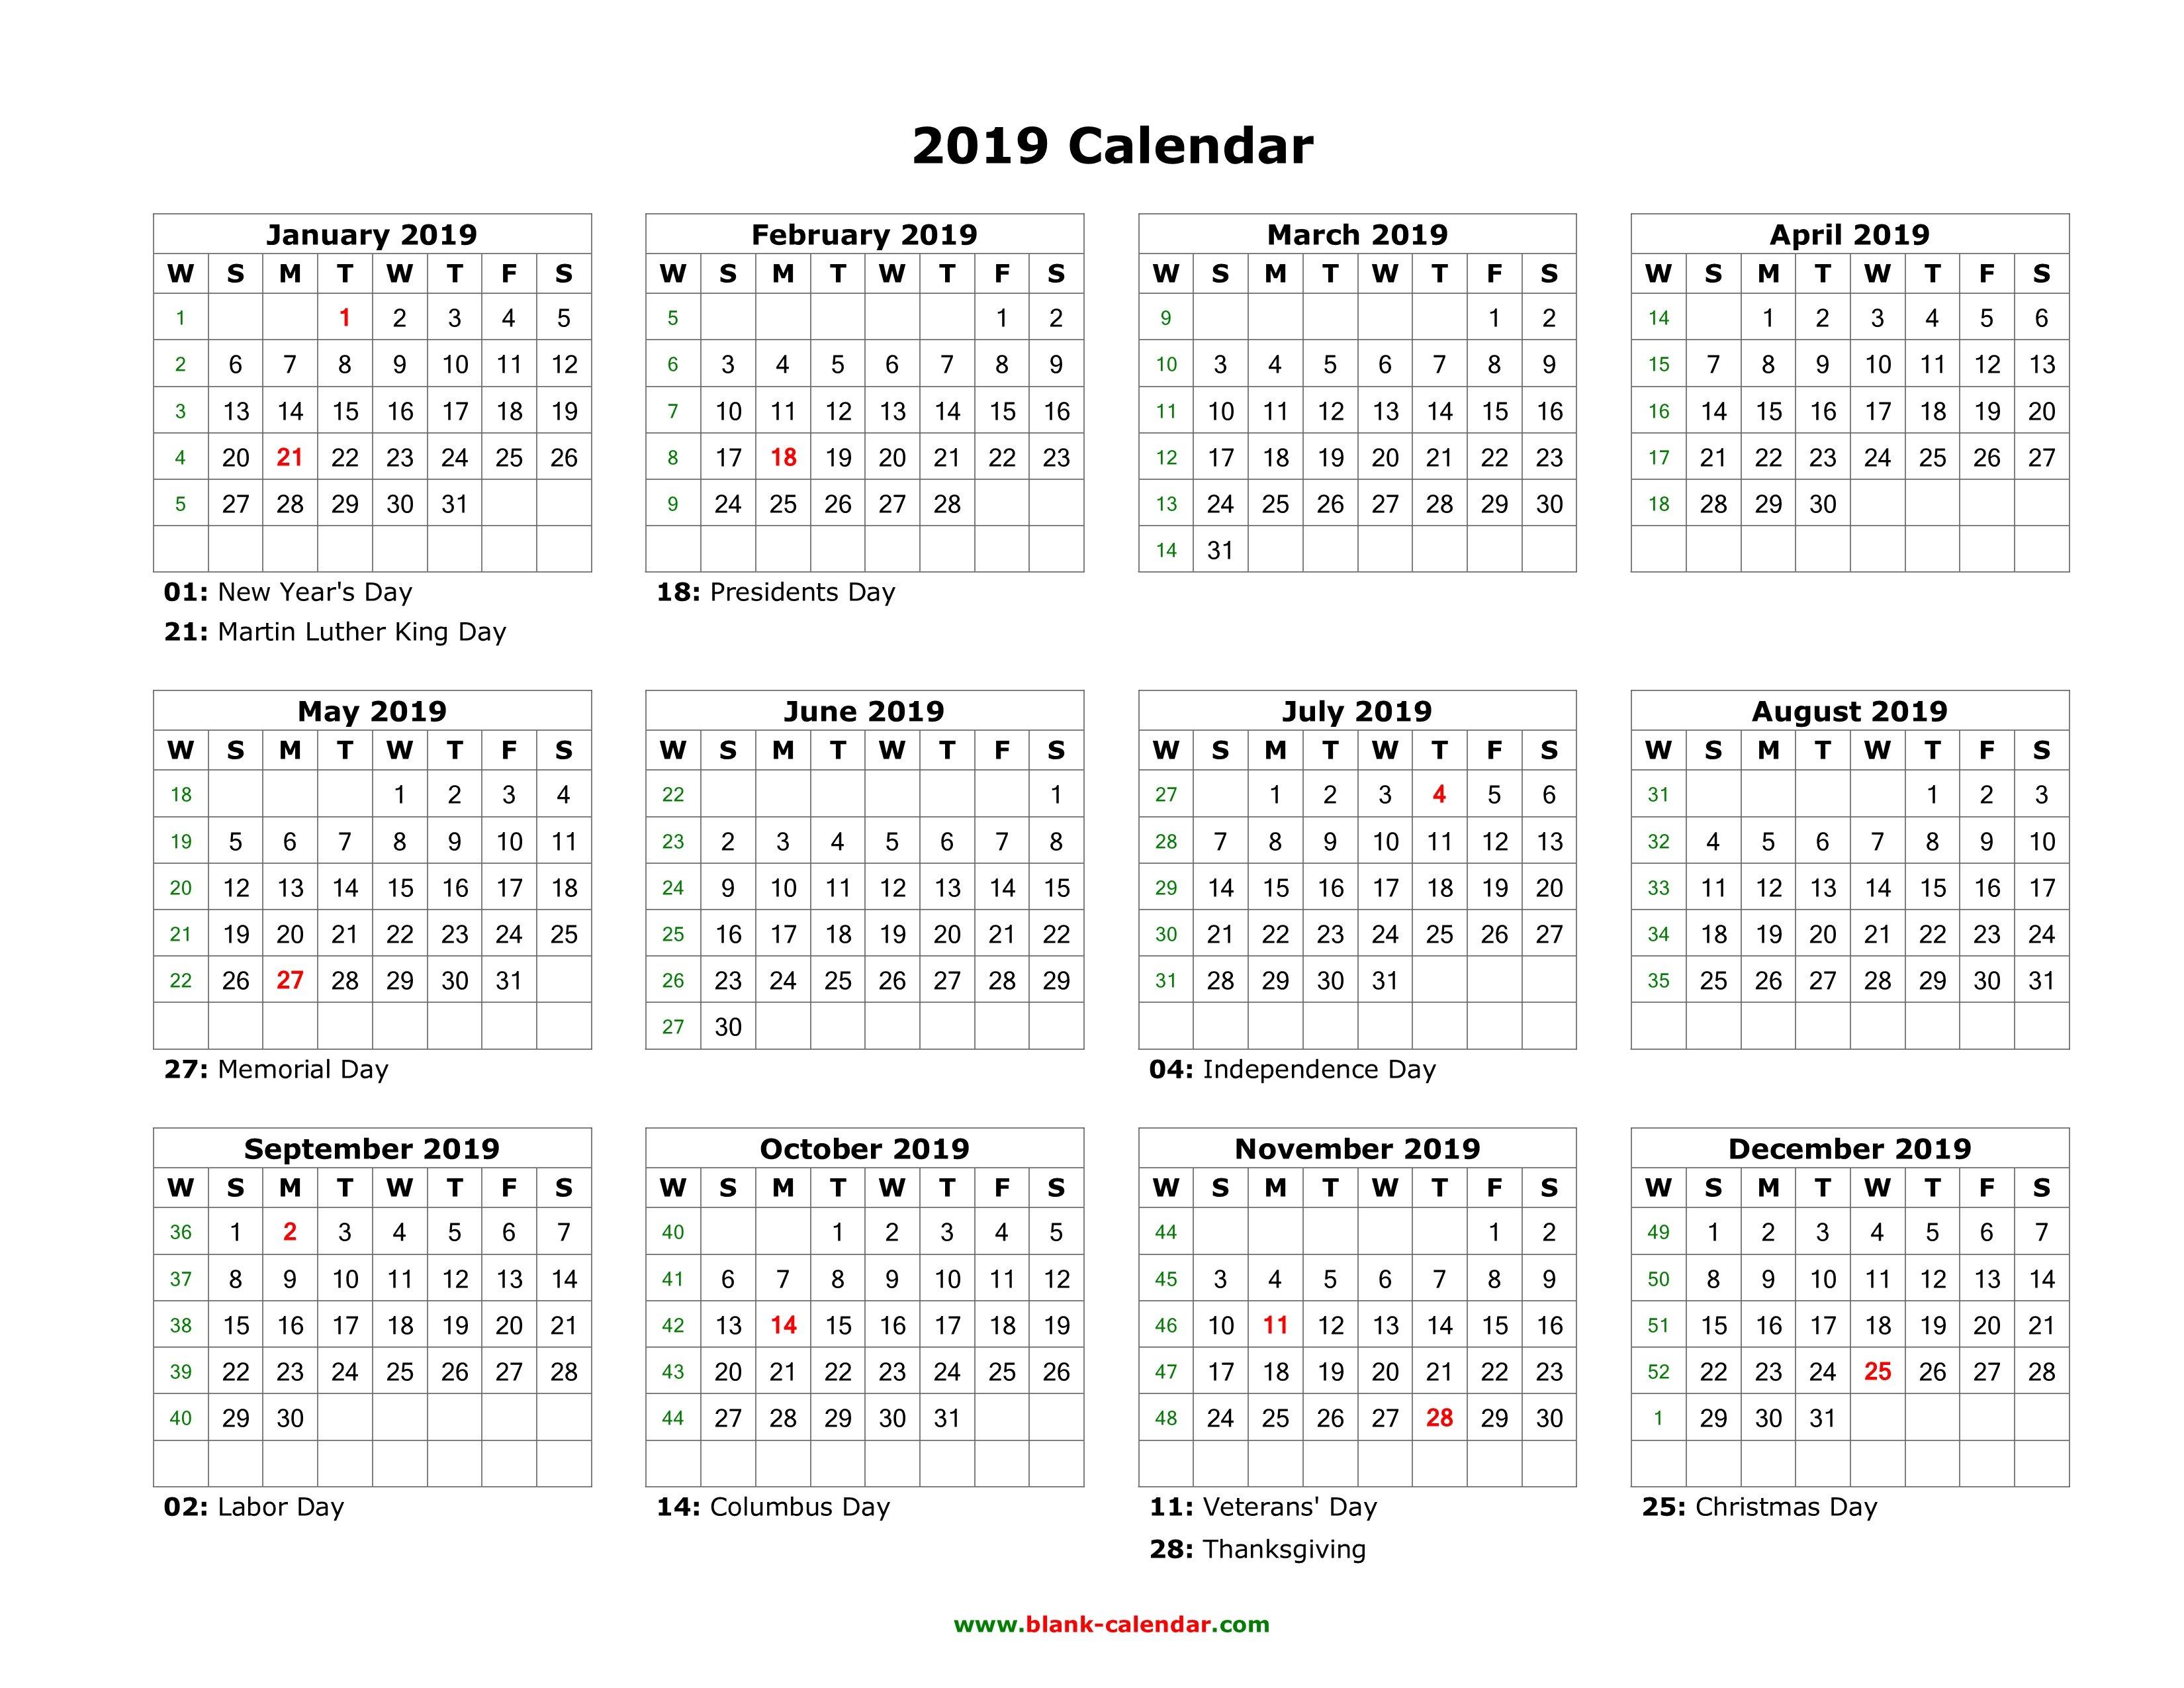 Blank Calendar 2019 | Free Download Calendar Templates Calendar 2019 Microsoft Word